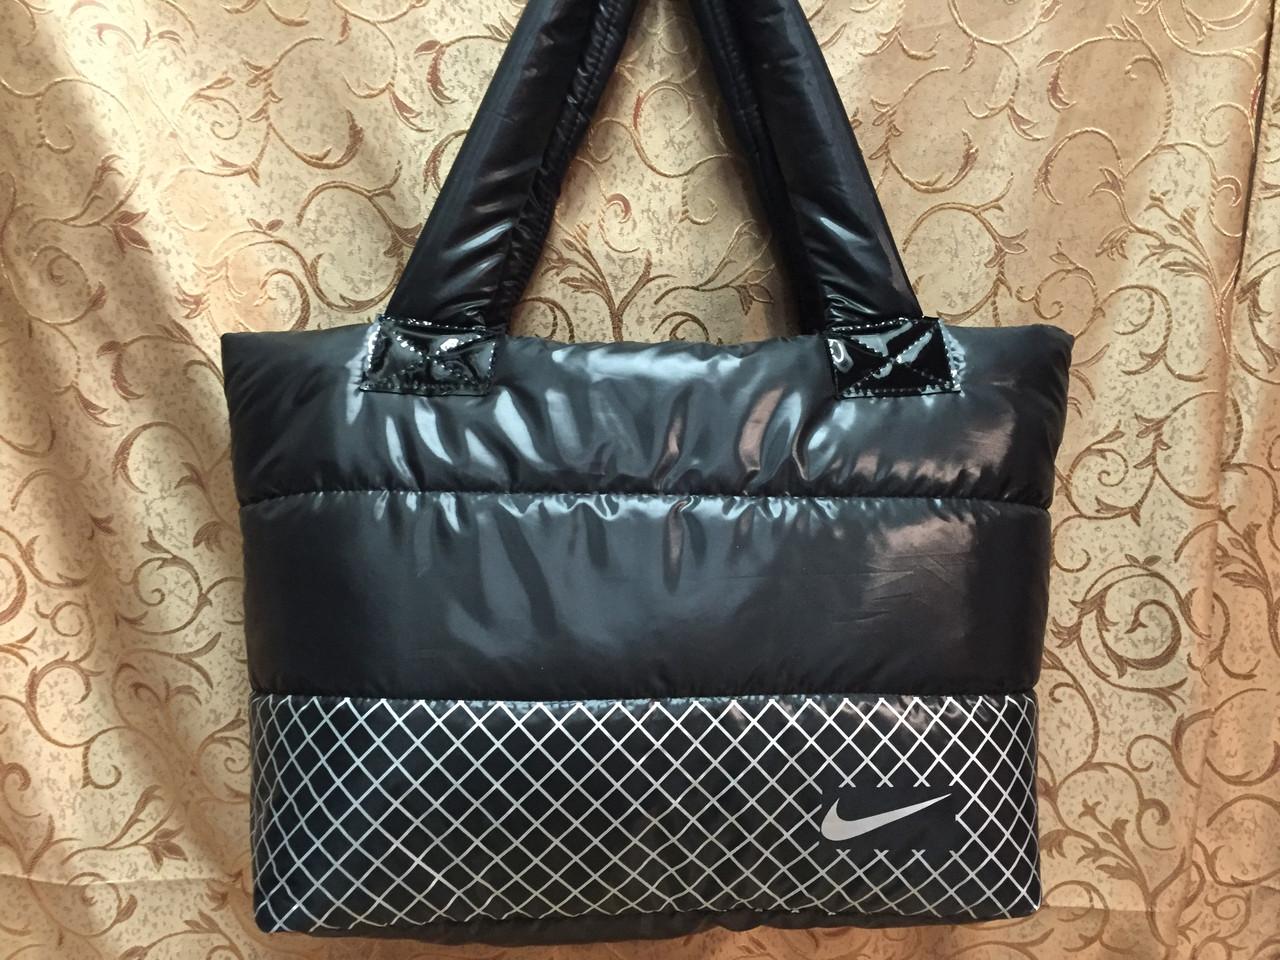 Сумка дутая Спортивная сумка NIKE Женские спортивная сумка(только оптом)Сумка  стильный дутики 43cbaa04e9a